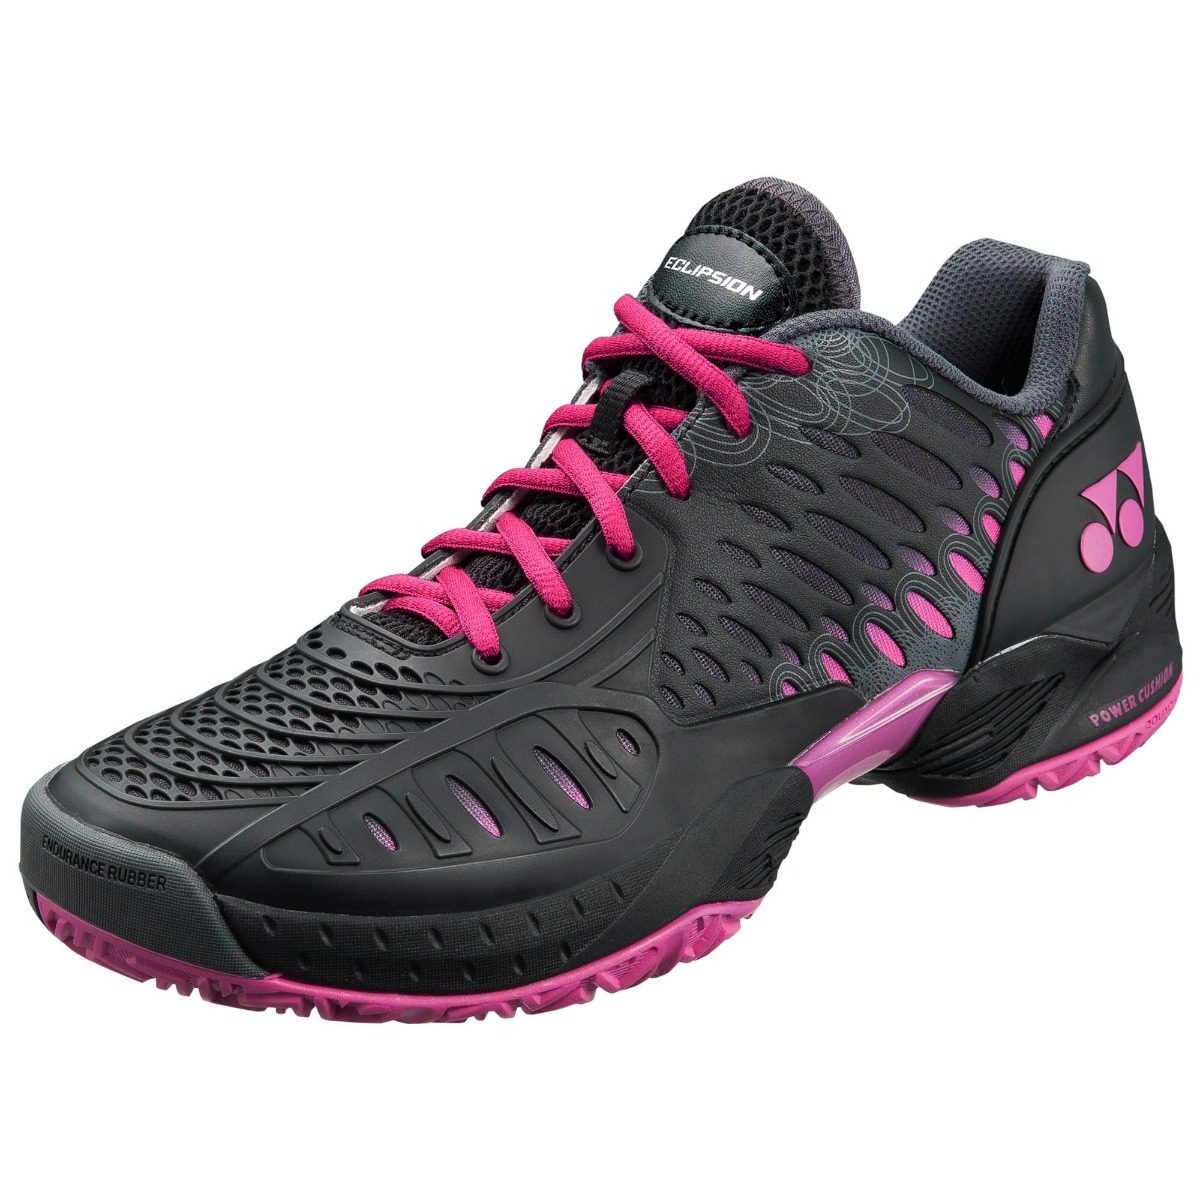 07b936a7a35ac zapatillas yonex eclipsion mujer all court tenis padel negra. Cargando zoom.